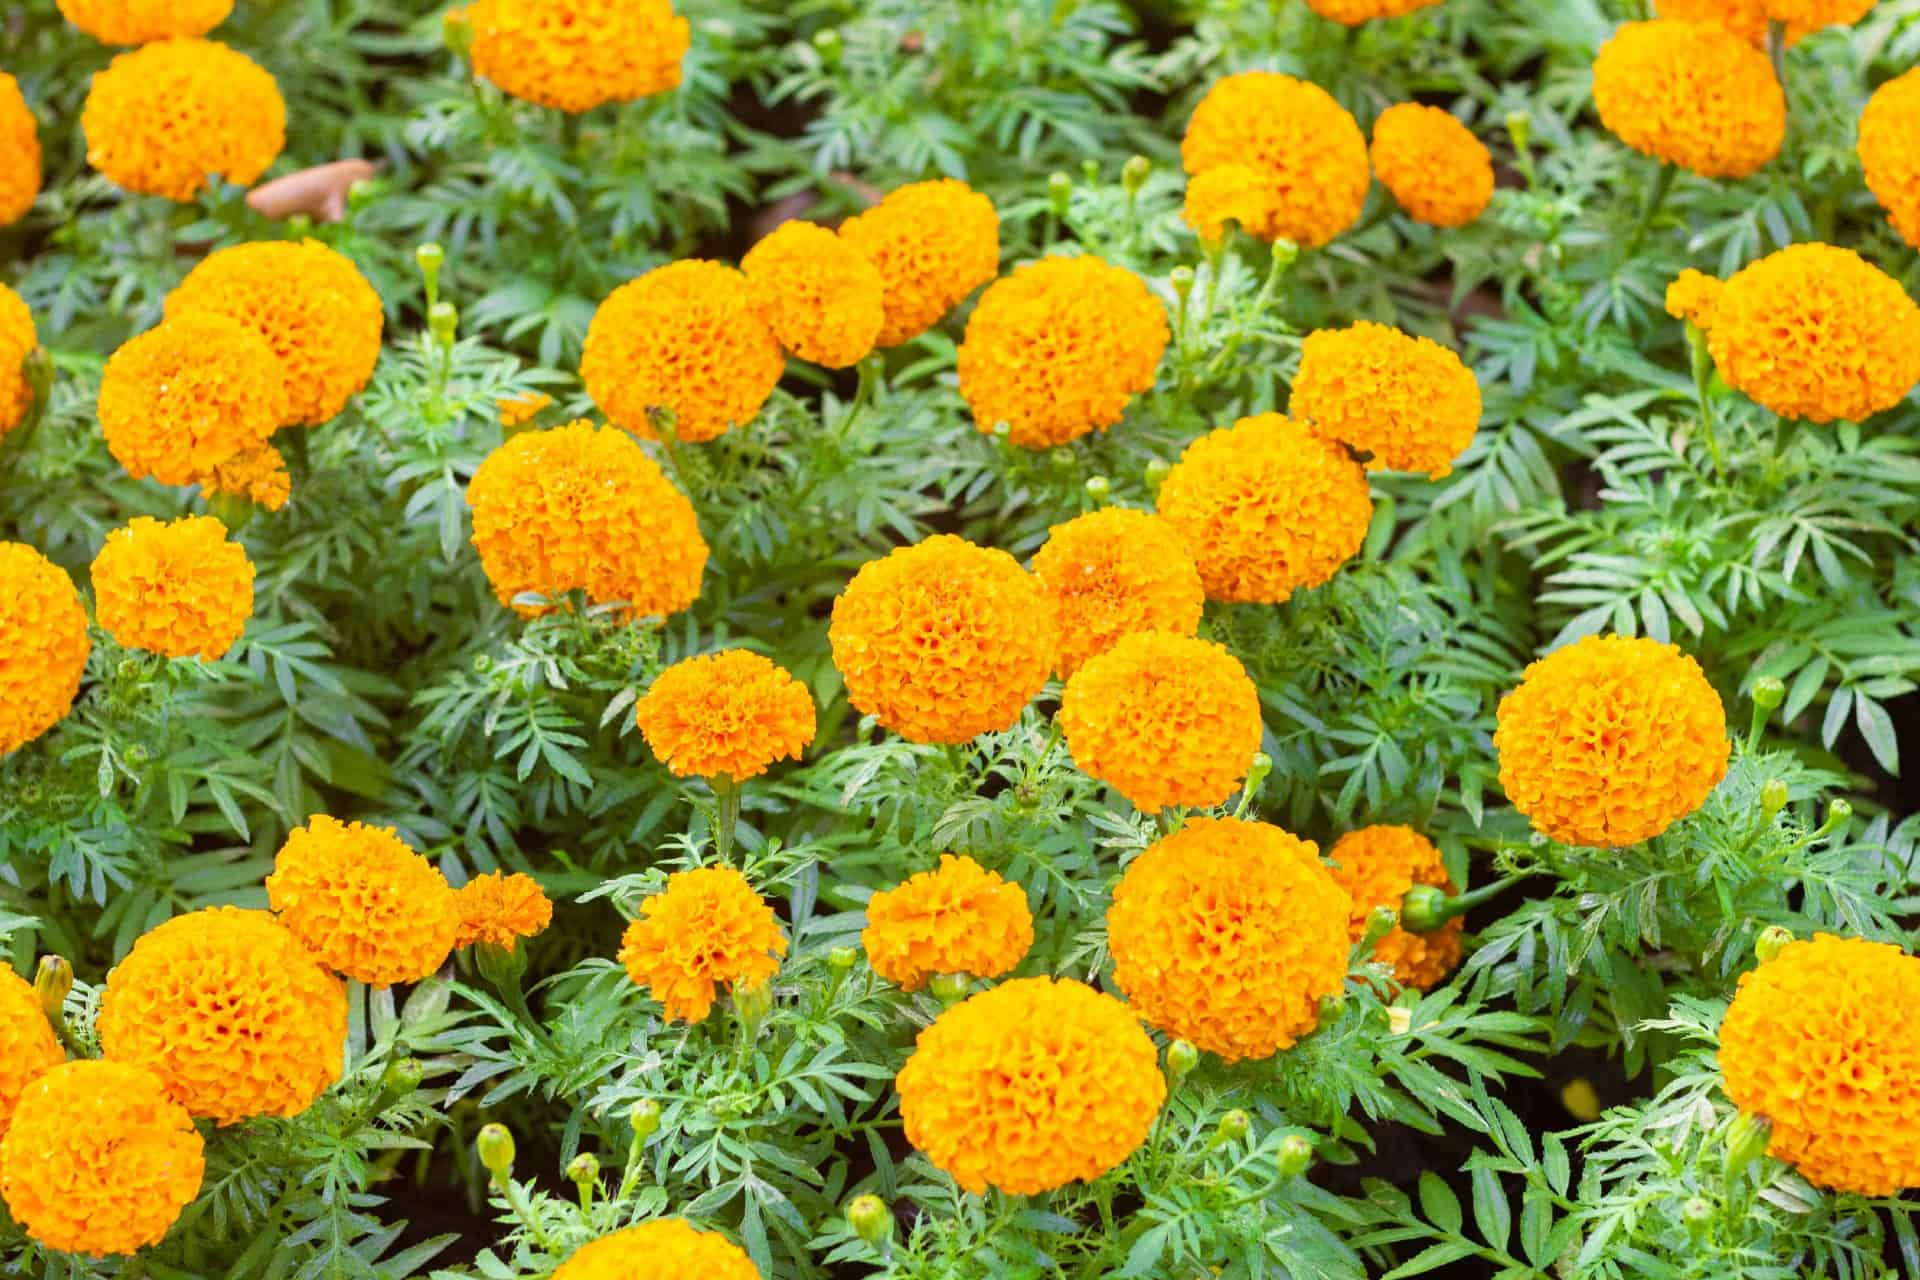 African marigolds produce carnation-like flowers.